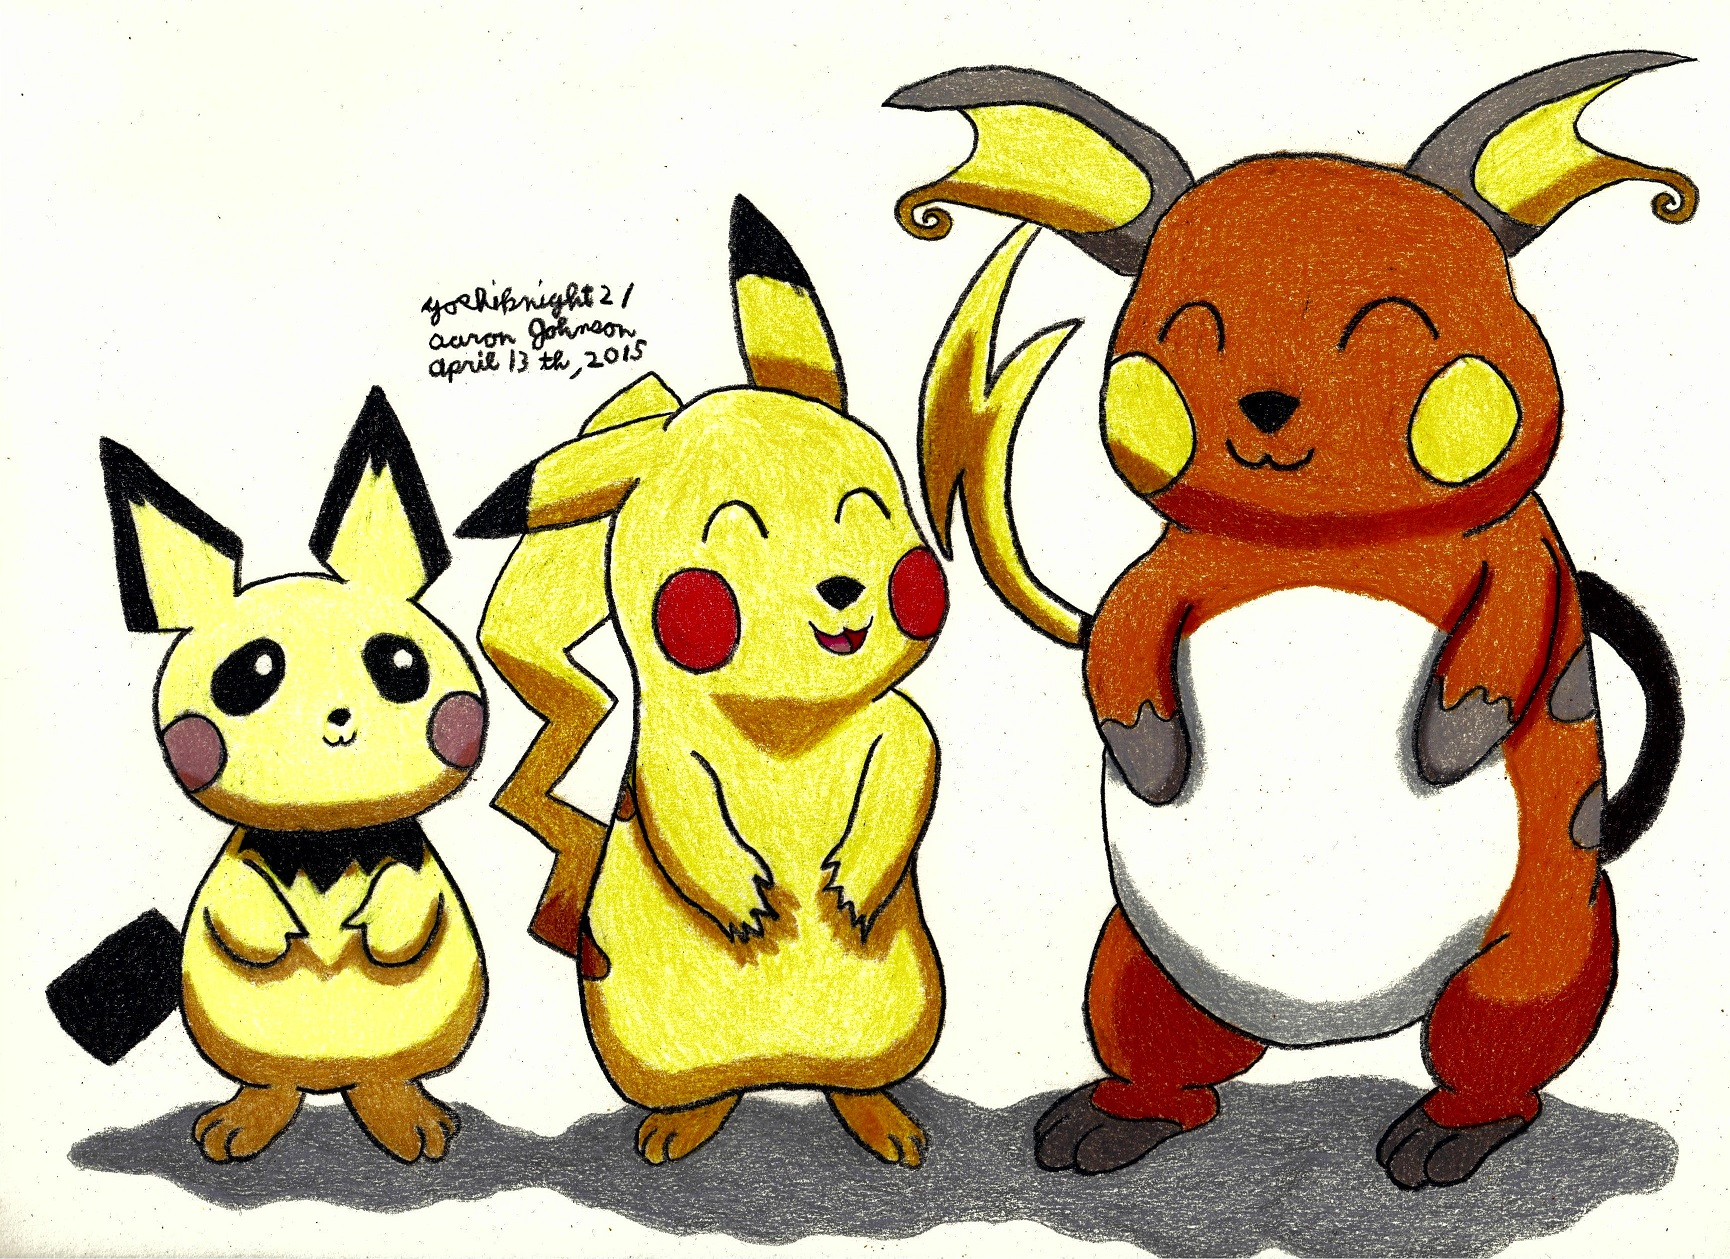 Pichu Pikachu Raichu Pokemon 528450938